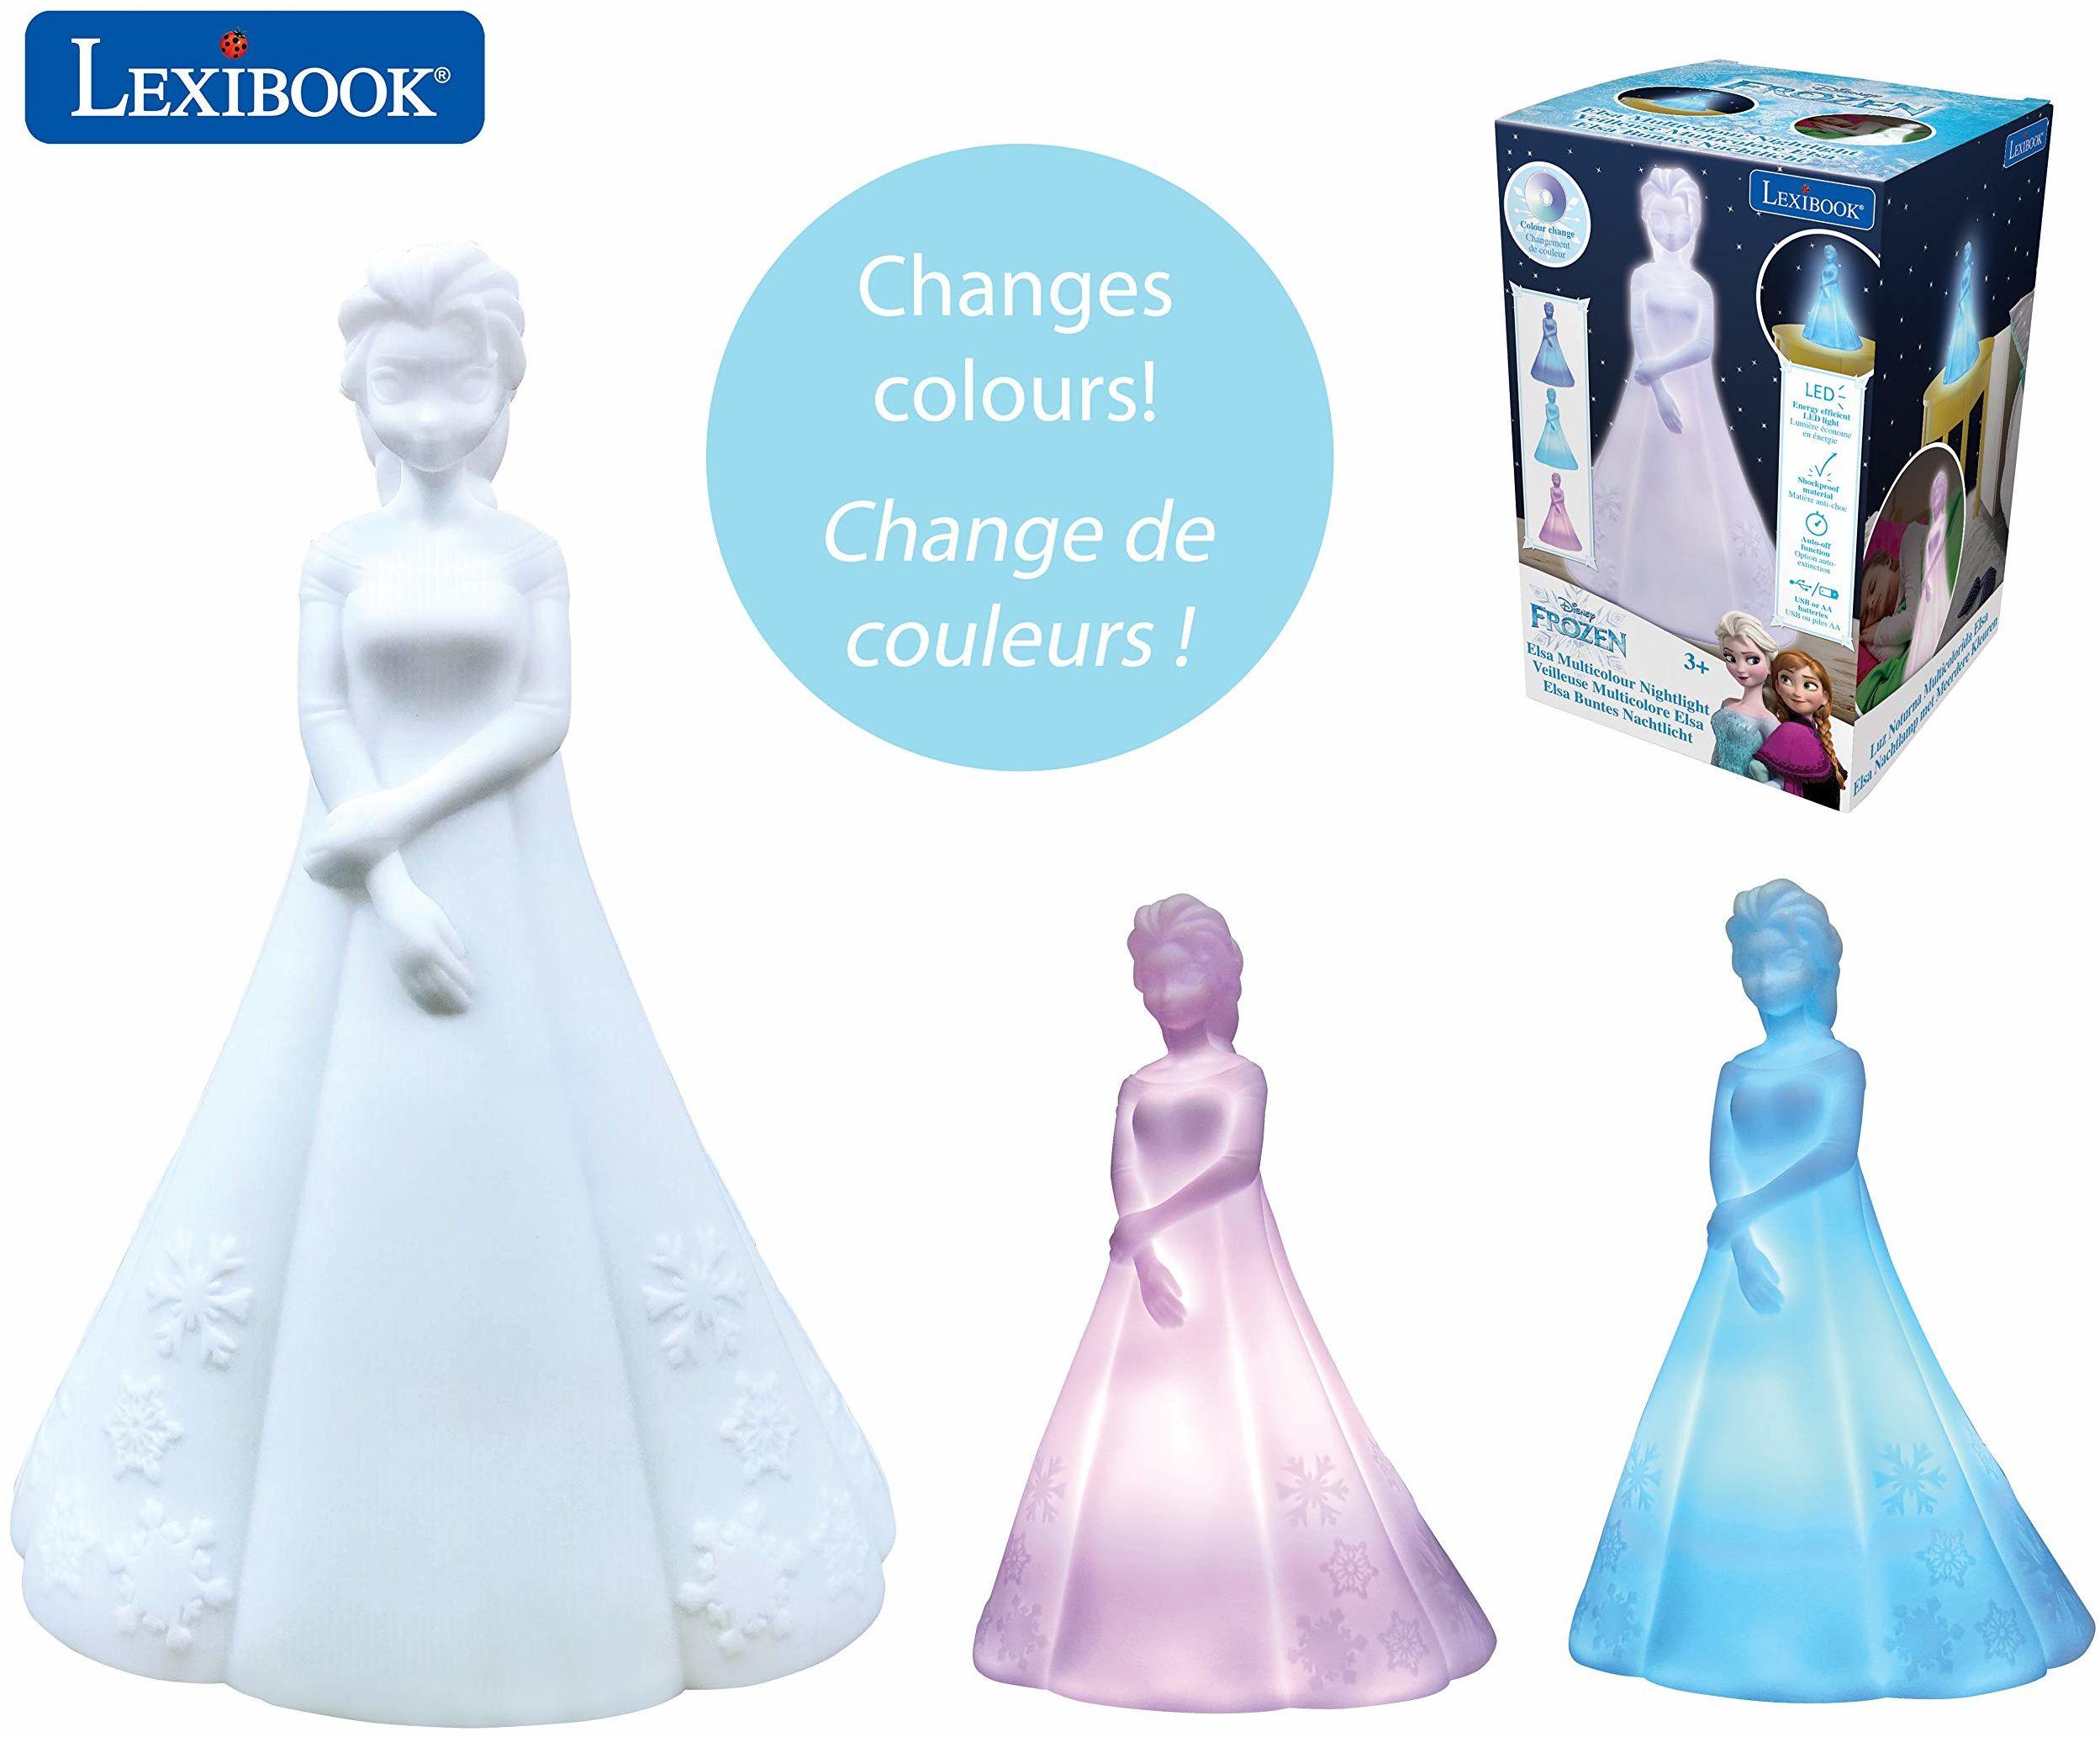 Lexibook NLJ110FZ Elsa Frozen Wielokolorowa lampka nocna - Disney kolorowa lampka nocna dla dzieci z timerem